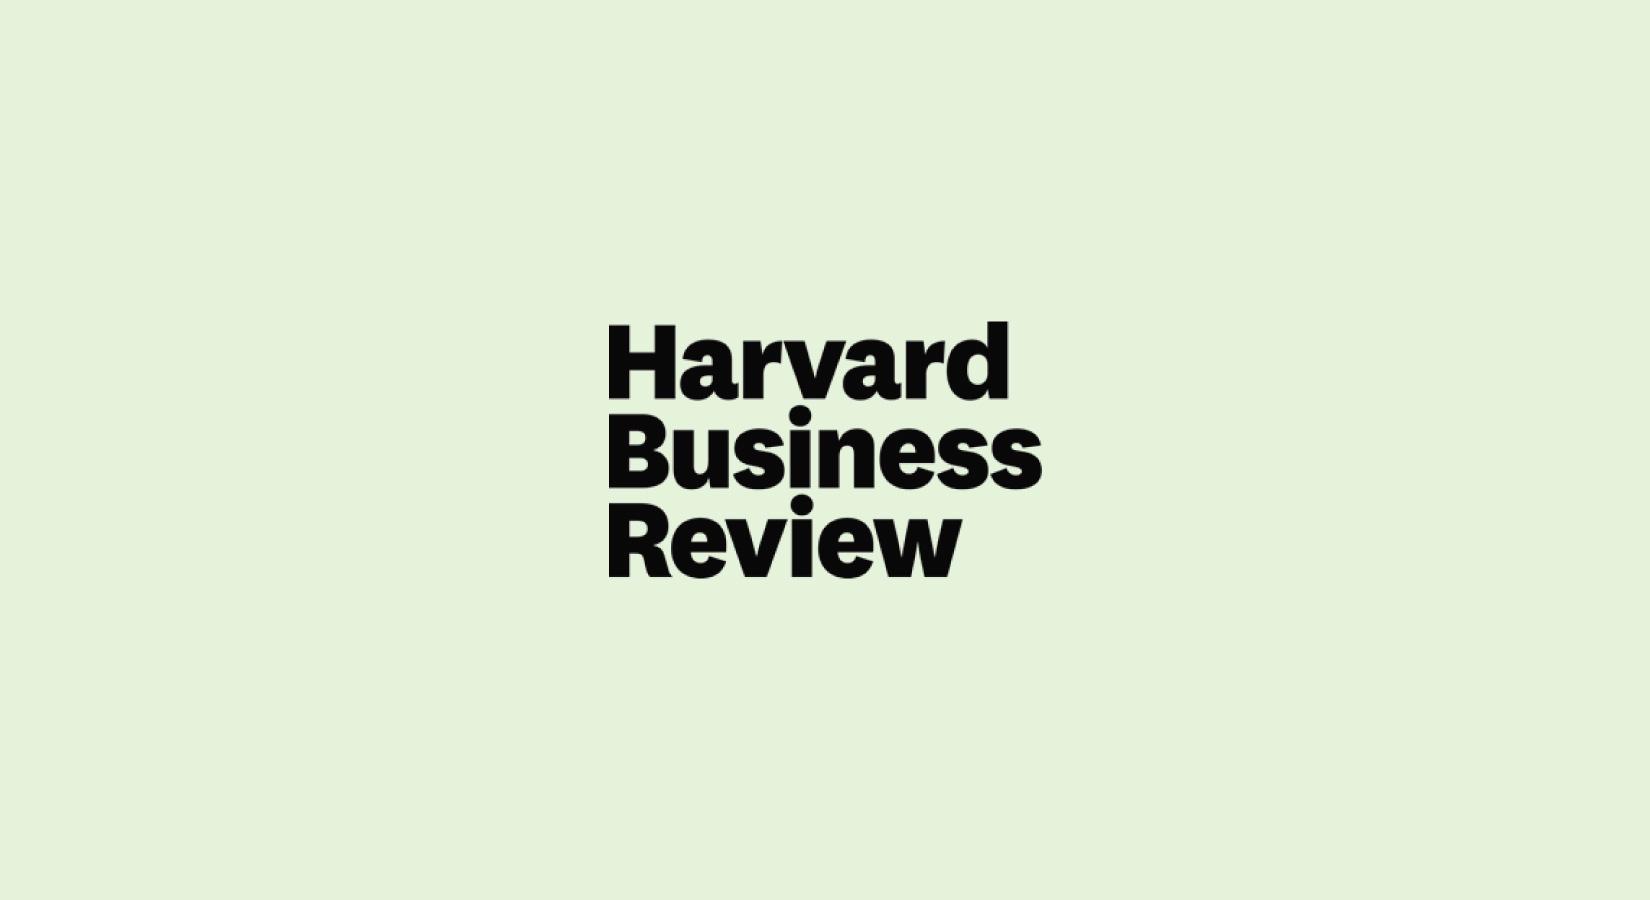 harvard business review - HD1650×900